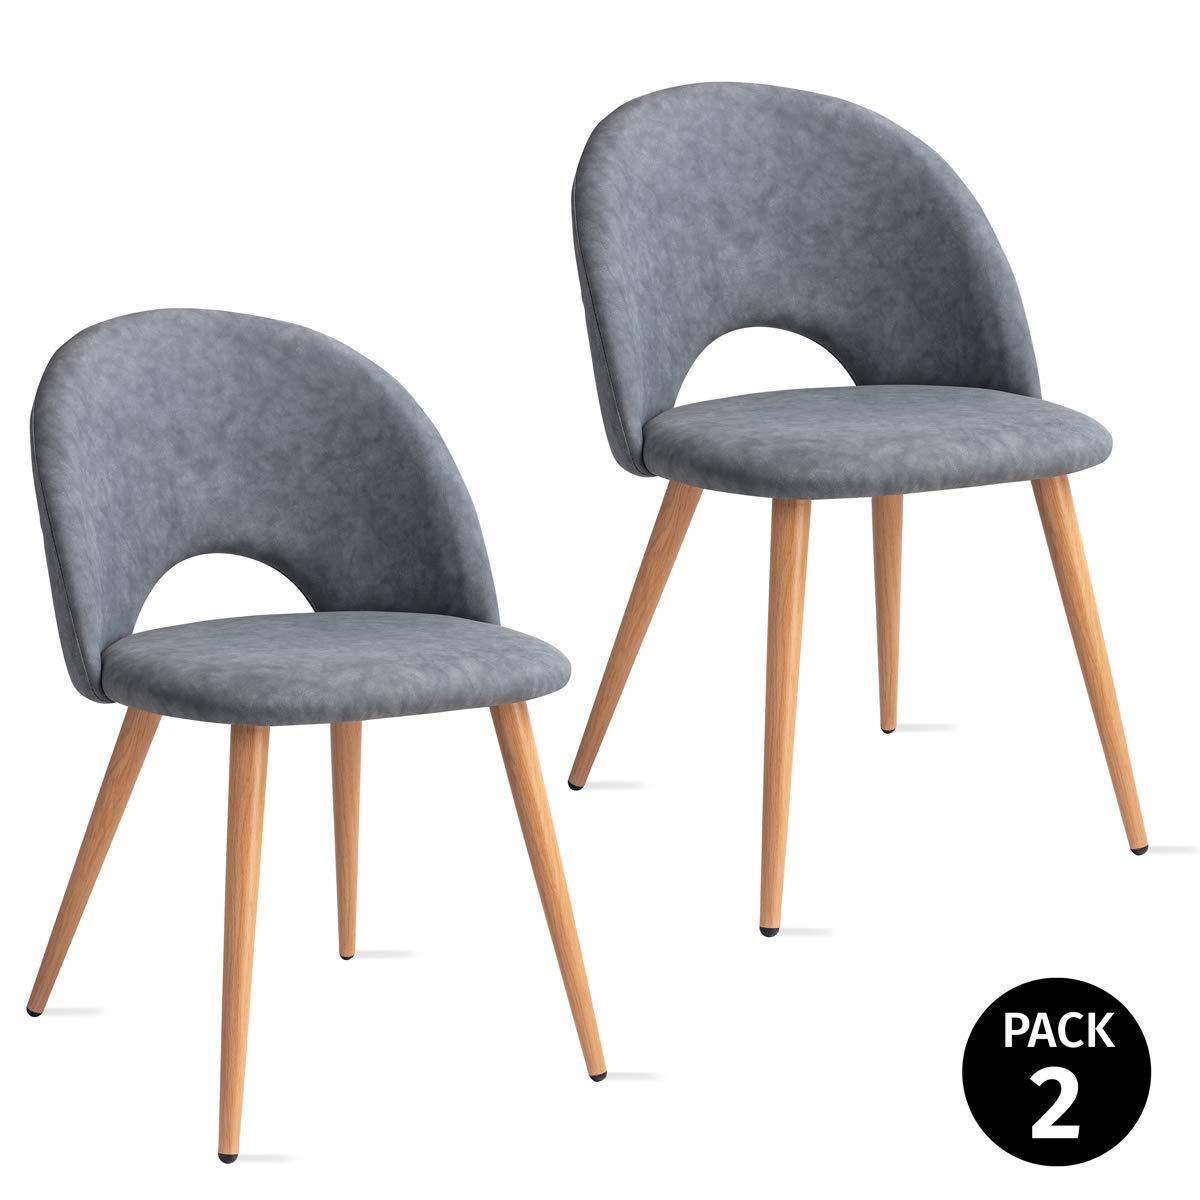 Mc Haus Pack 2 sedie Luna nordico design blu cielo sala pranzo 49x46x76cm